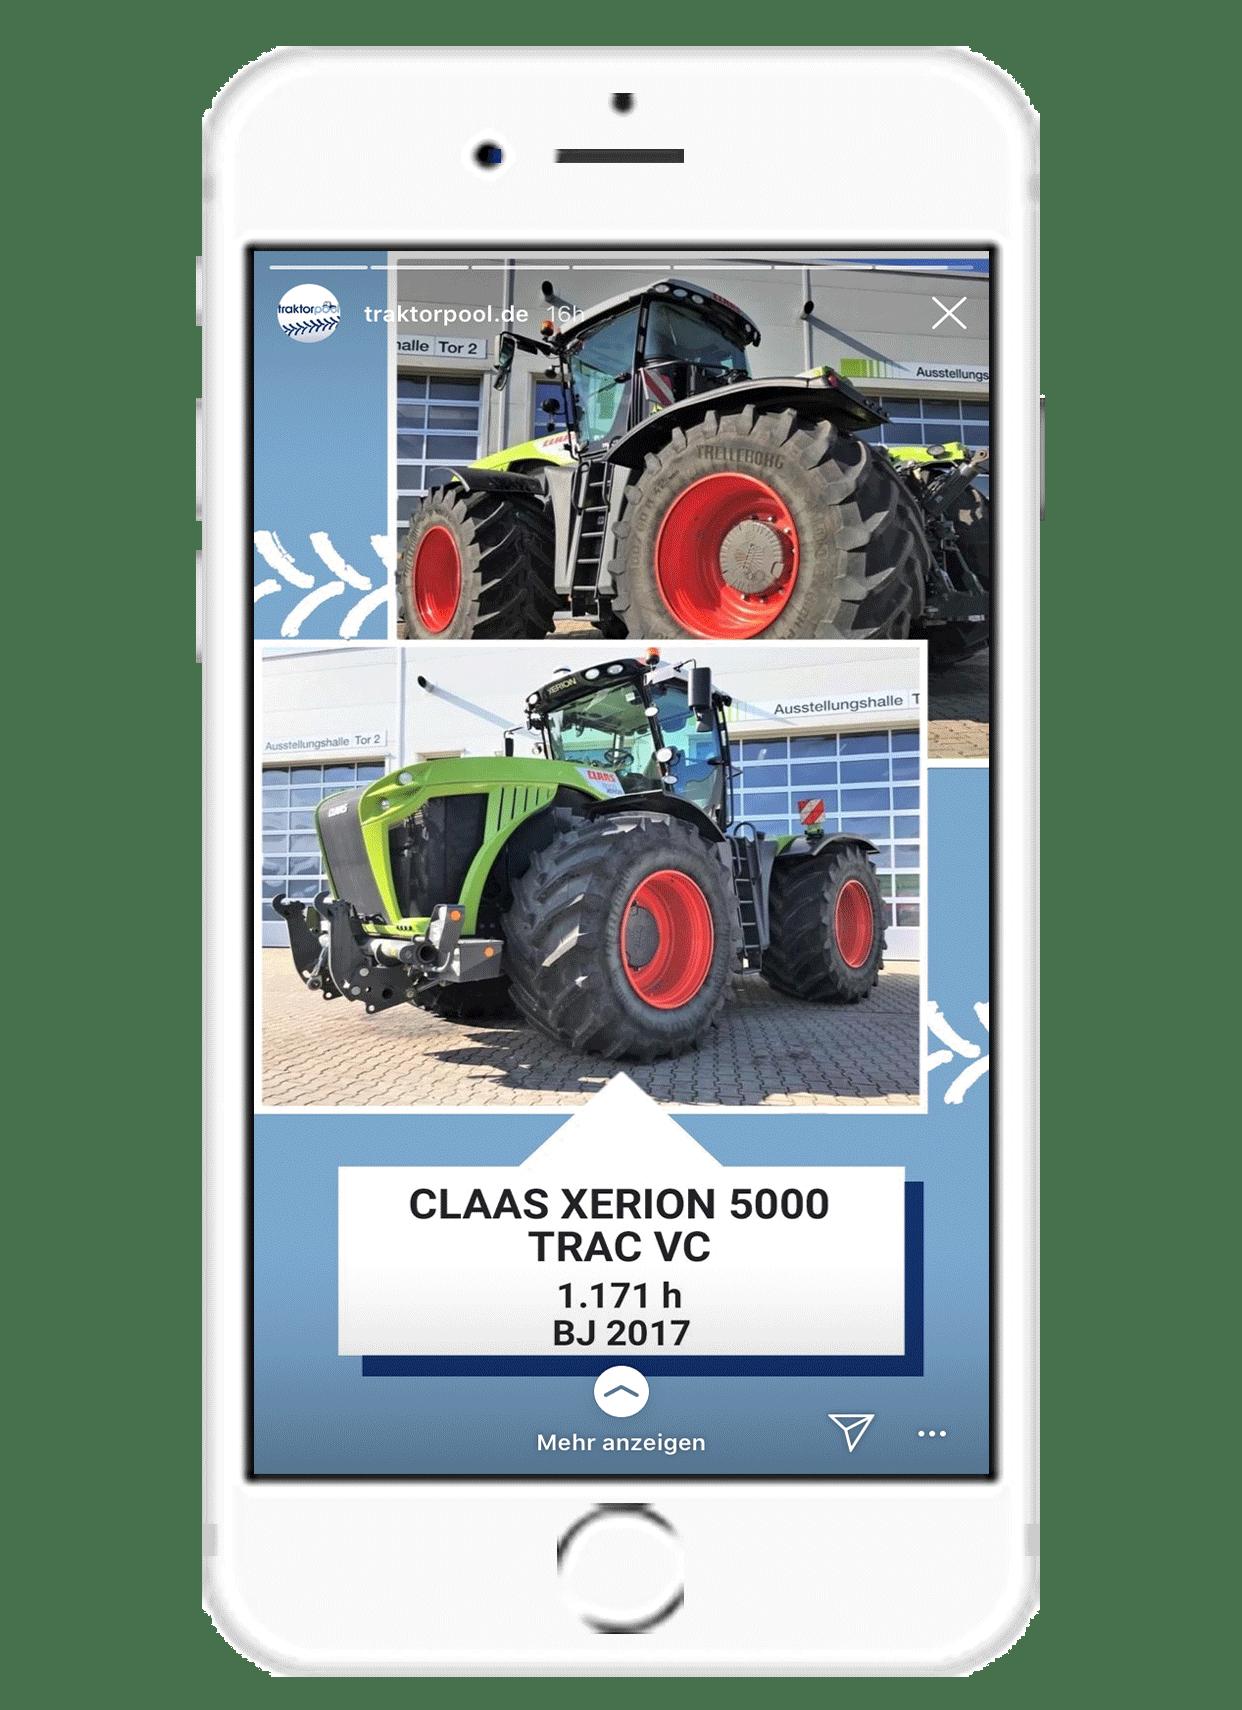 traktorpool auf Instagram